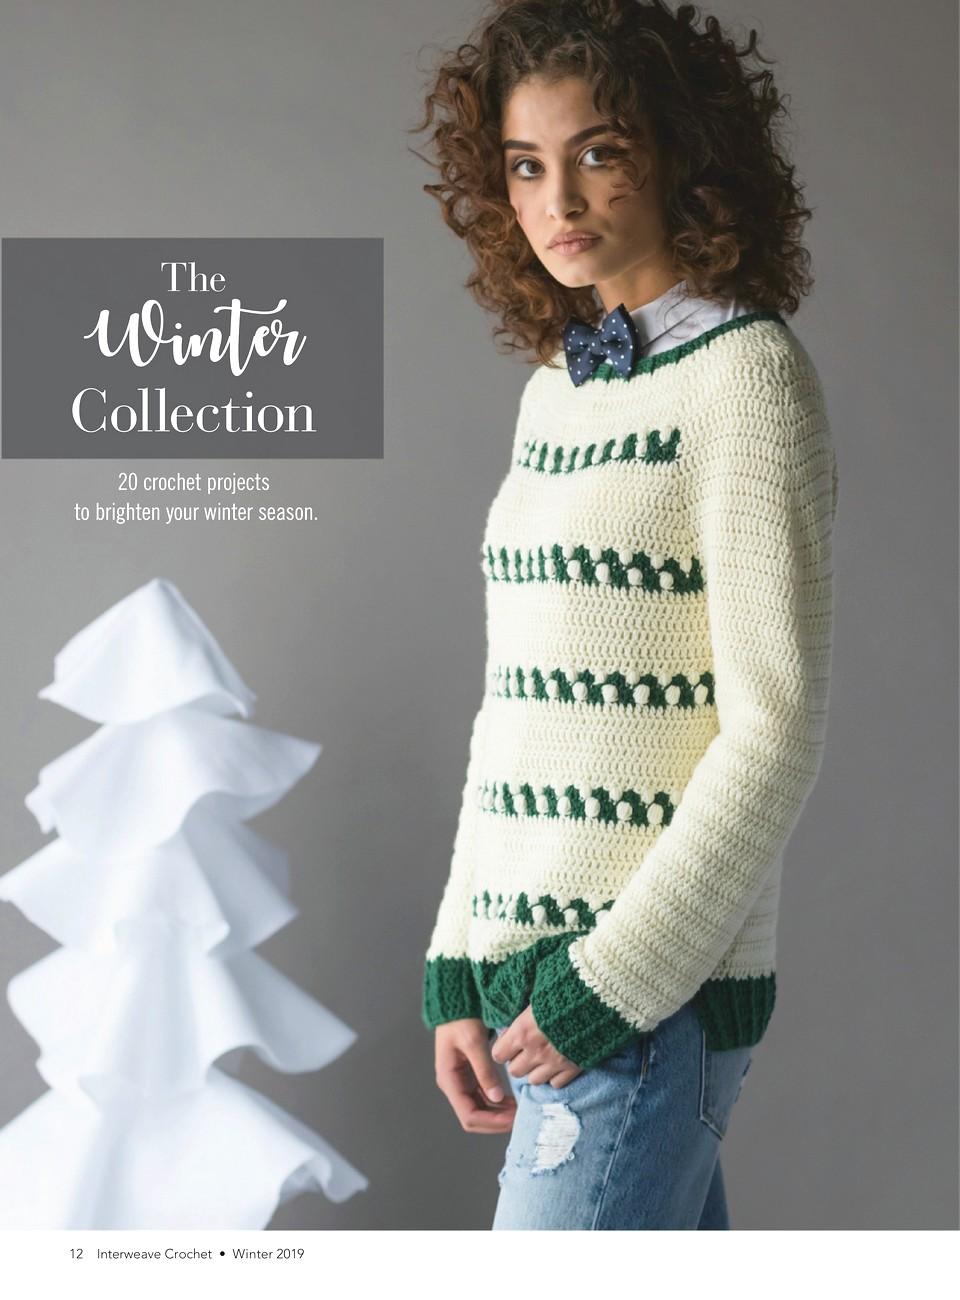 Interweave Crochet Winter 2019-13